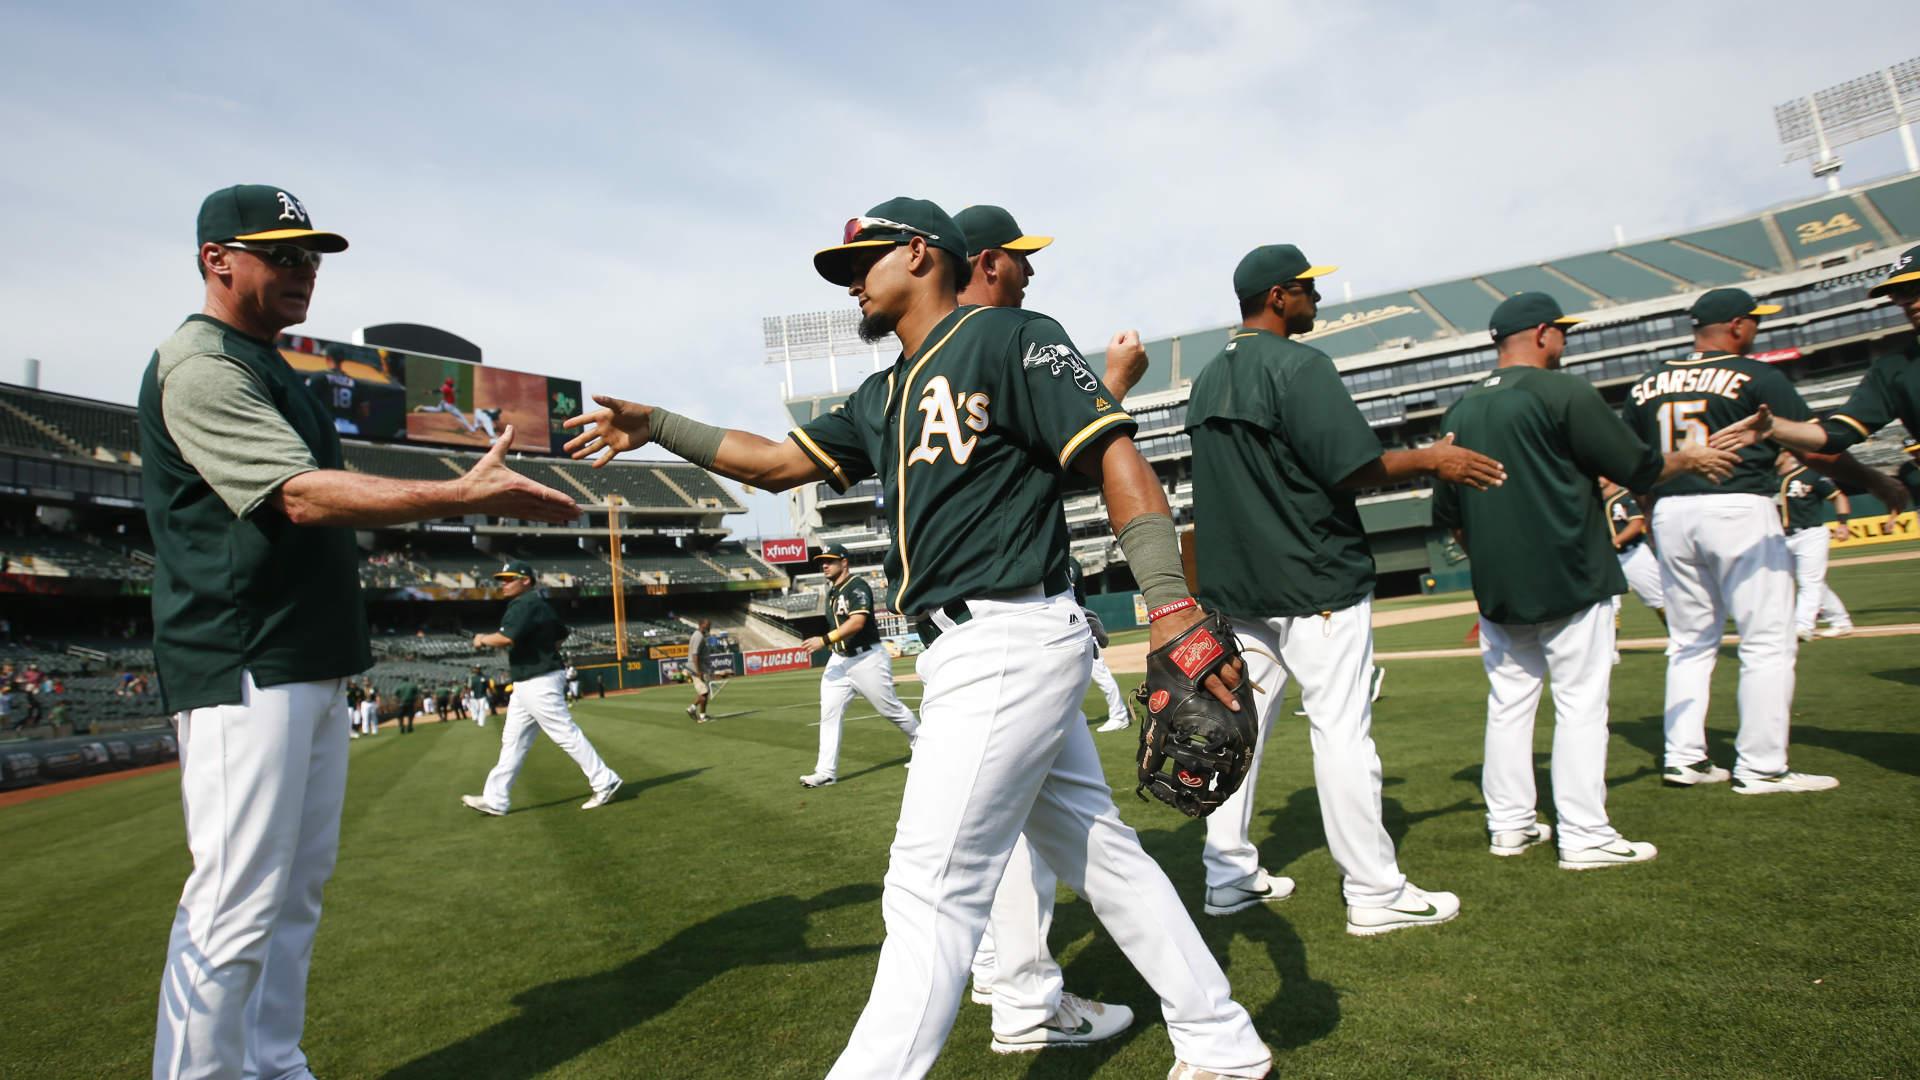 Oakland-Athletics-022118-USNews-Getty-FTR